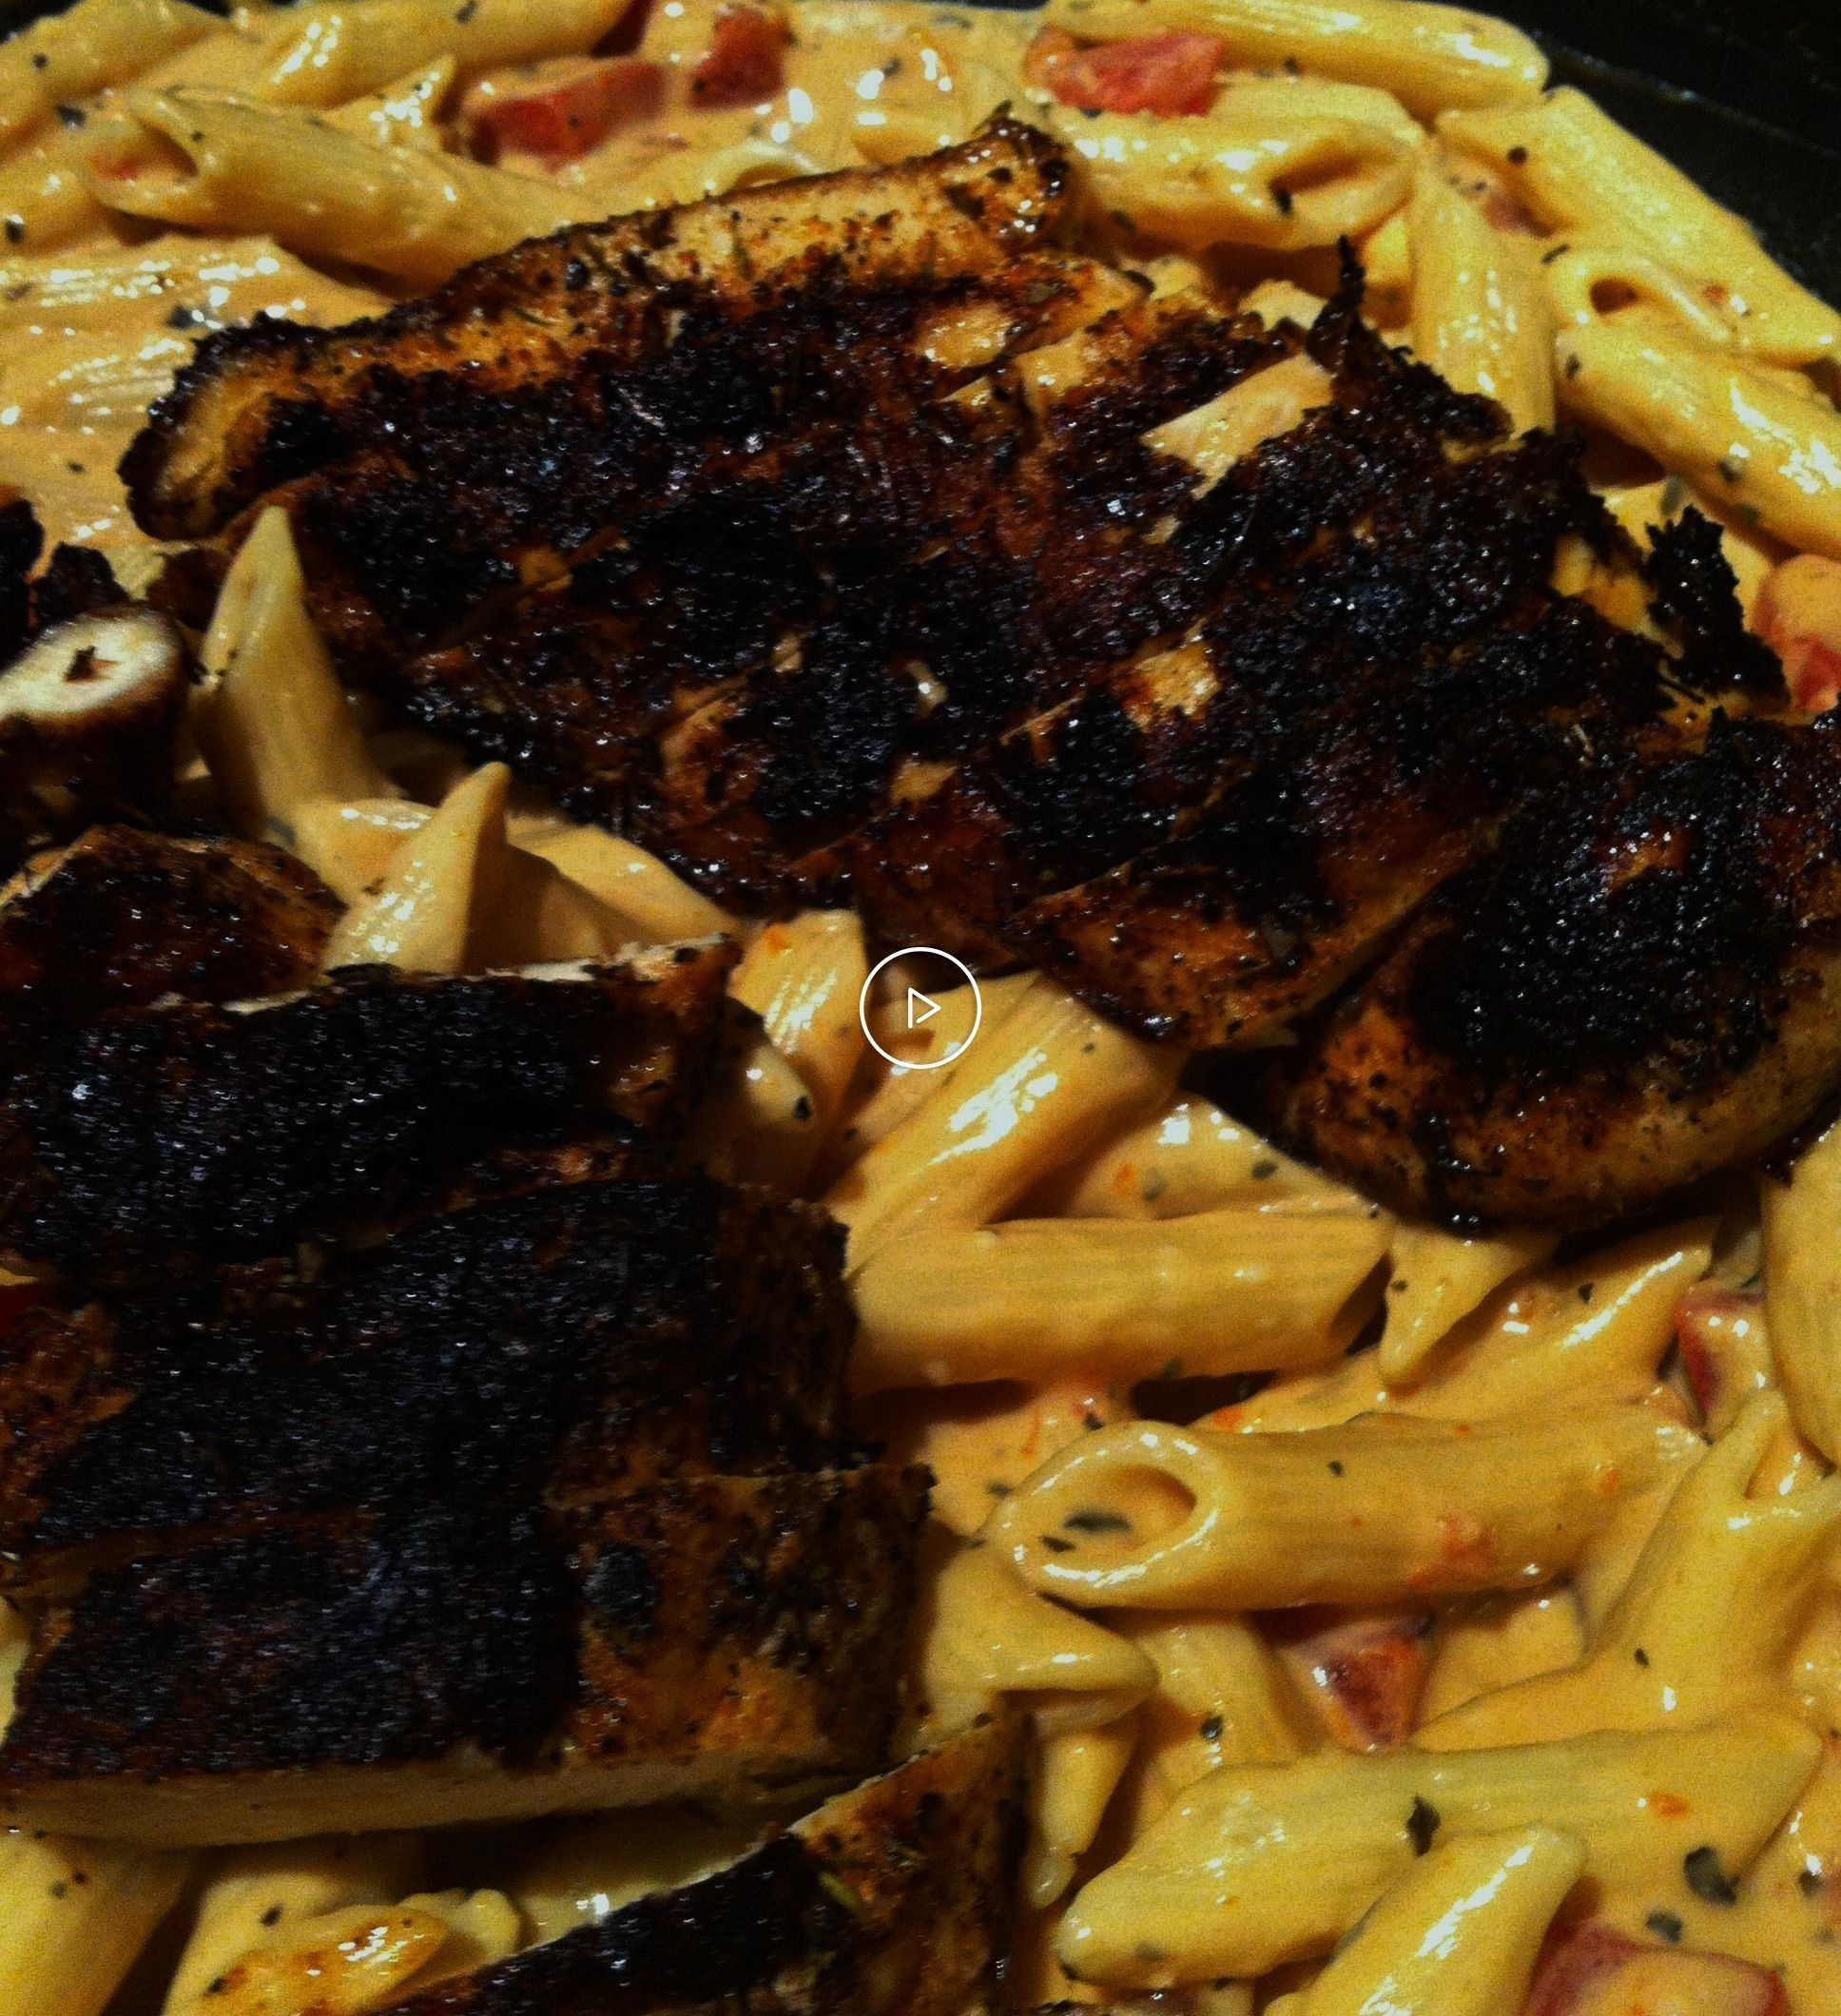 Penne with Blackened Chicken and SunDried Tomato Basil Sauce #blackenedchicken #blackened #sundried #chicken #tomato #penne #basil #sauce #with #andPenne with Blackened Chicken and Sun-Dried Tomato Basil SaucePenne with Blackened Chicken and Sun-Dried Tomato Basil Sauce #blackenedchicken Penne with Blackened Chicken and SunDried Tomato Basil Sauce #blackenedchicken #blackened #sundried #chicken #tomato #penne #basil #sauce #with #andPenne with Blackened Chicken and Sun-Dried Tomato Basil SaucePe #blackenedchicken